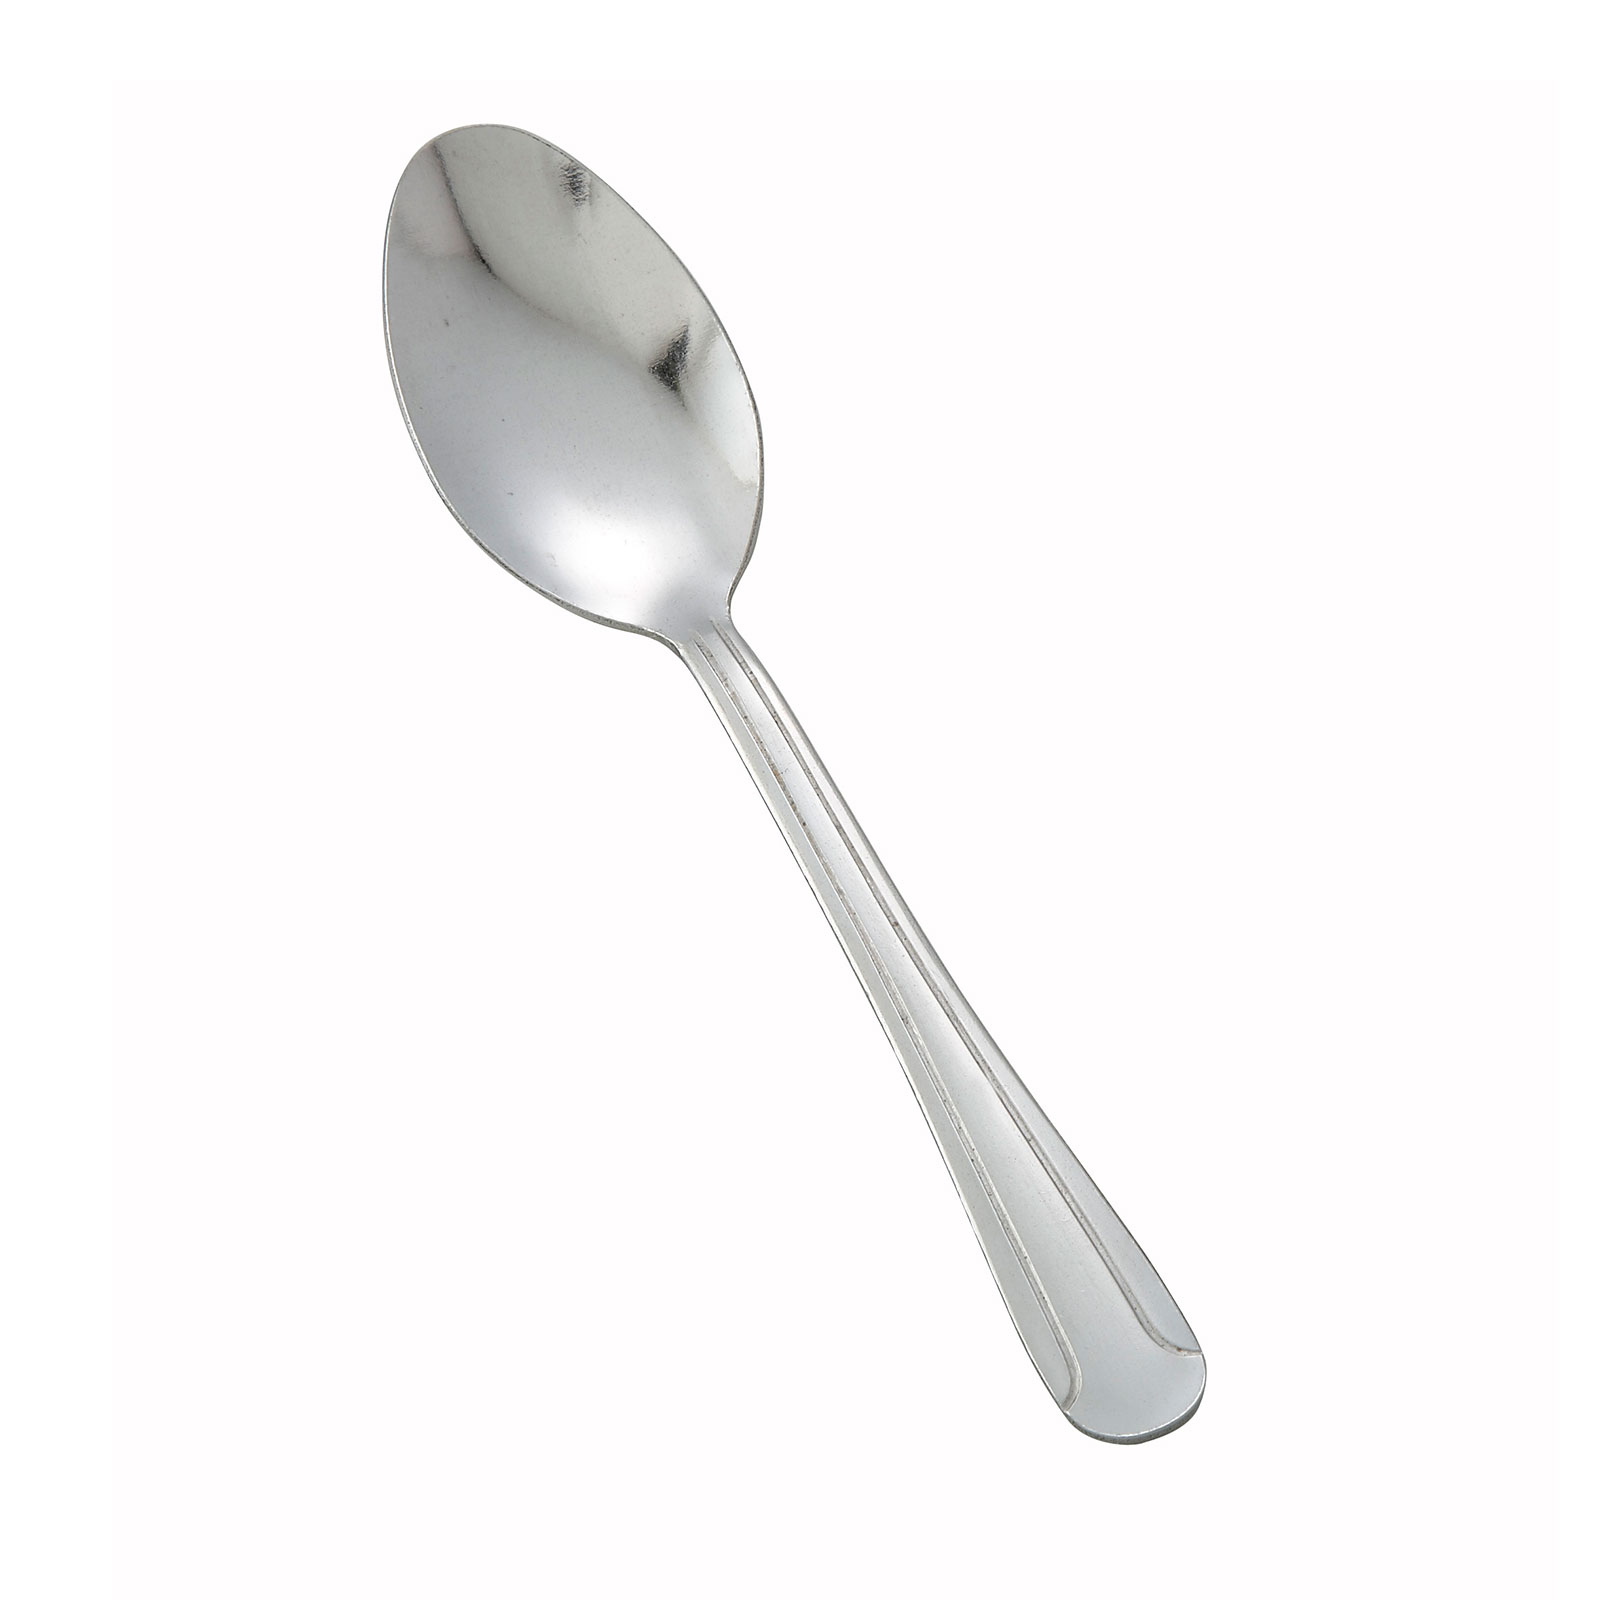 Winco 0014-01 spoon, coffee / teaspoon